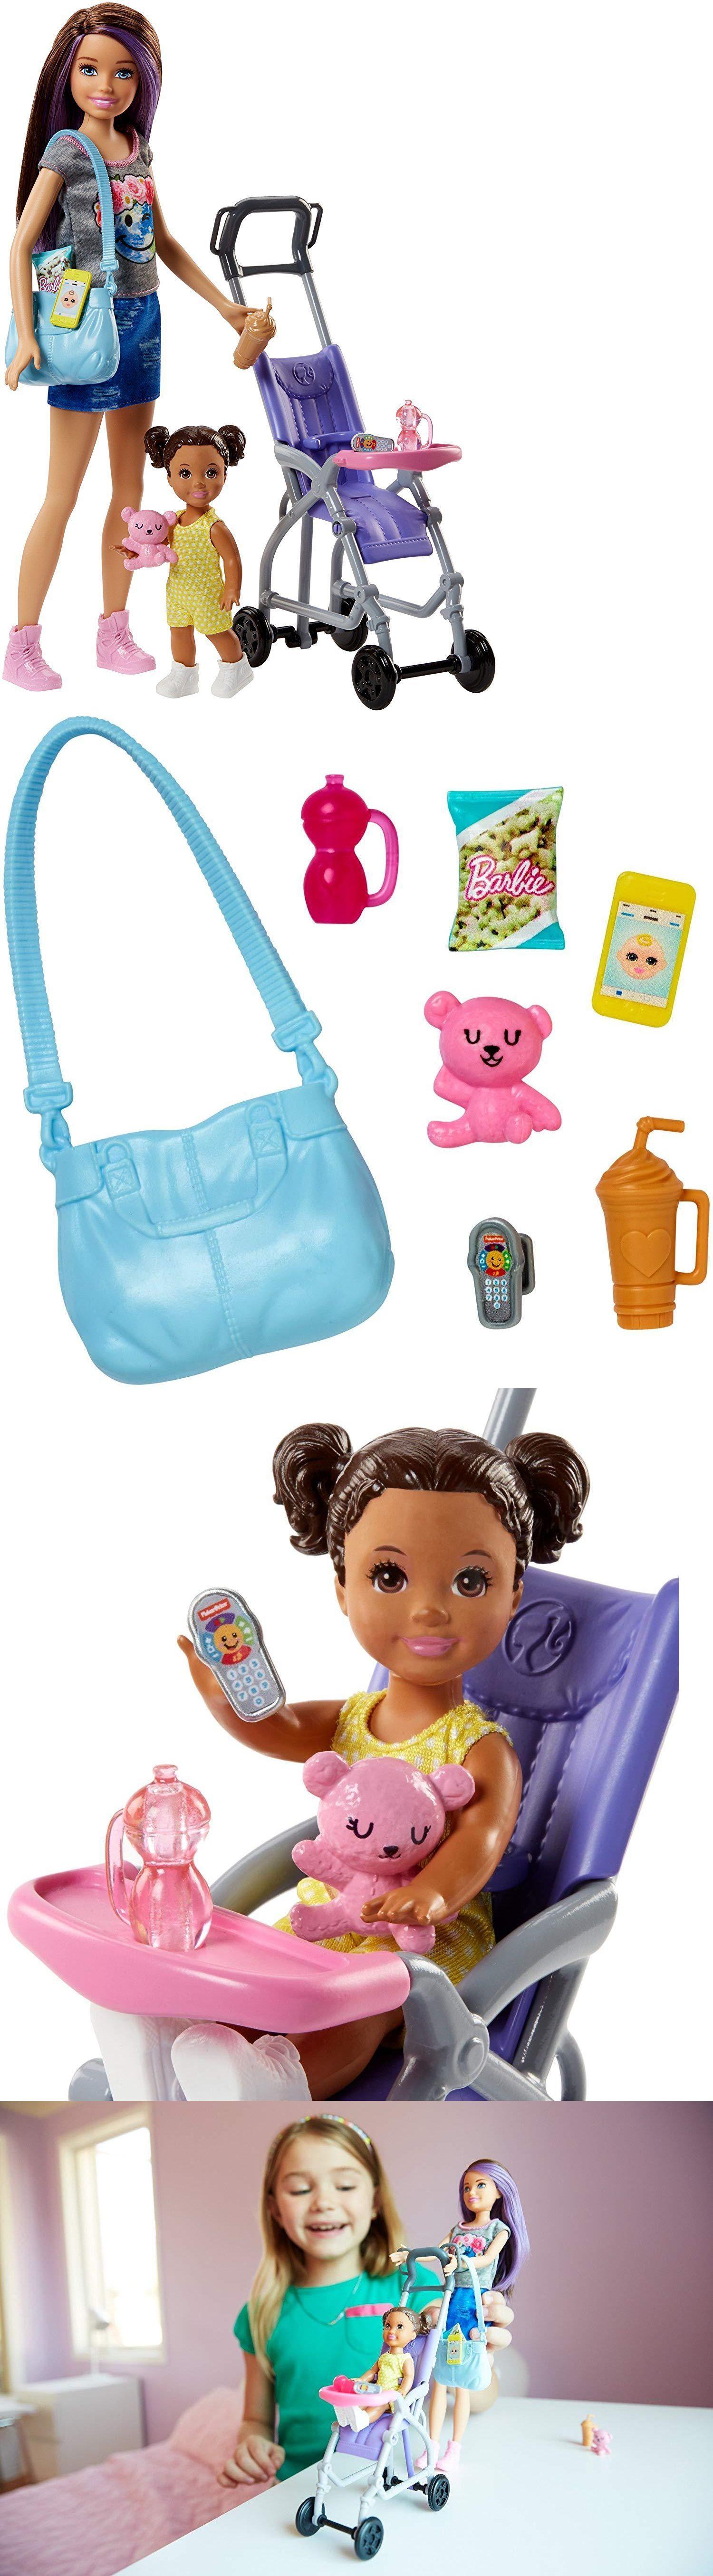 Dollhouses 20898 Barbie Skipper Babysitters Inc. Doll And